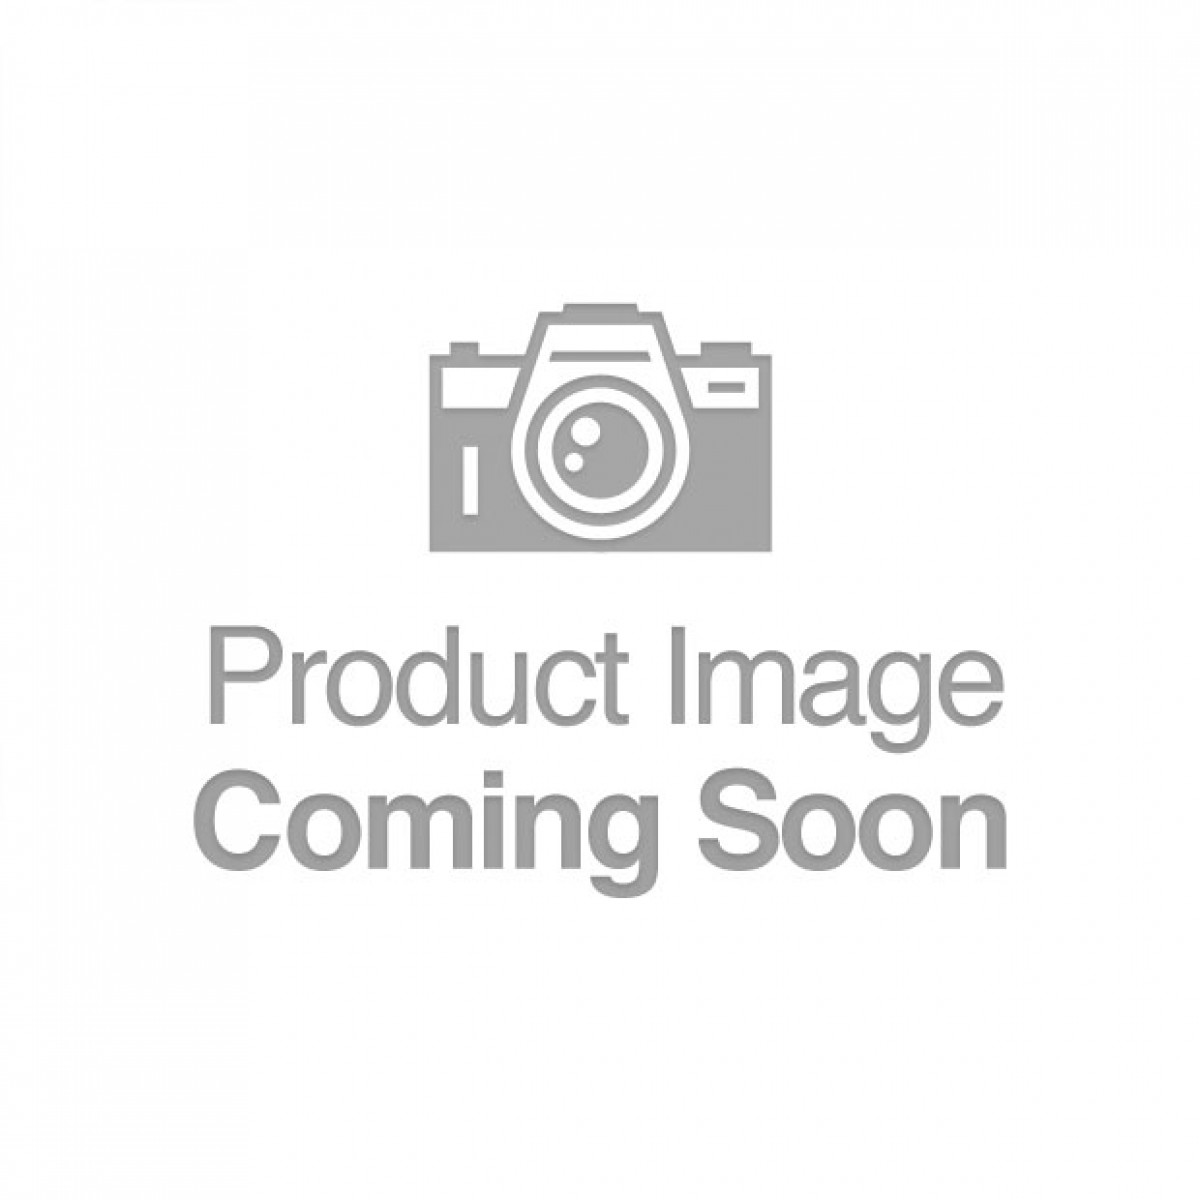 Kimono Micro Thin Variety Pack - Box Of 12